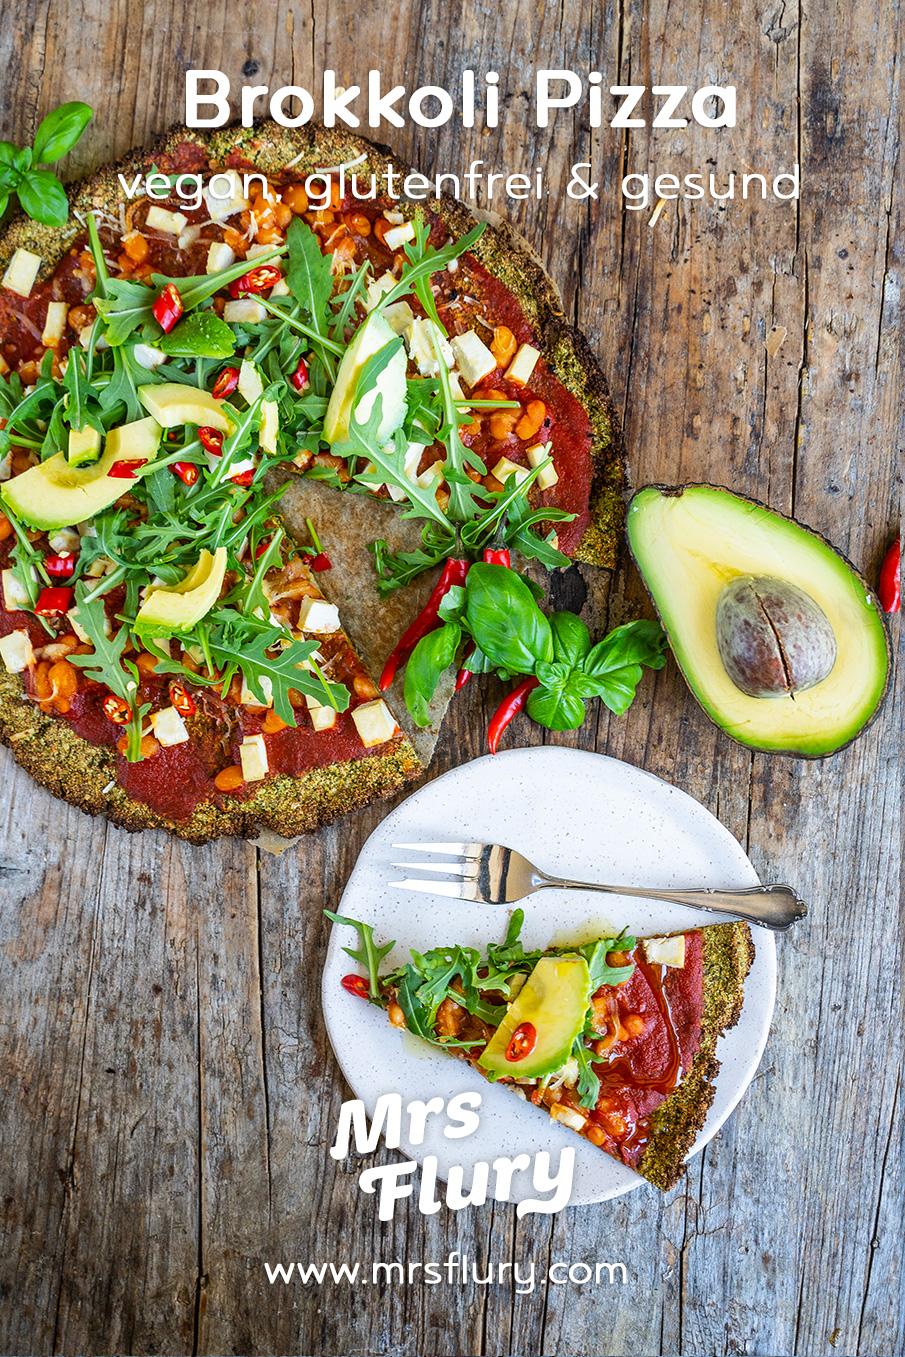 Low Carb Brokkoli Pizza vegan & glutenfrei Rezept Mrs Flury